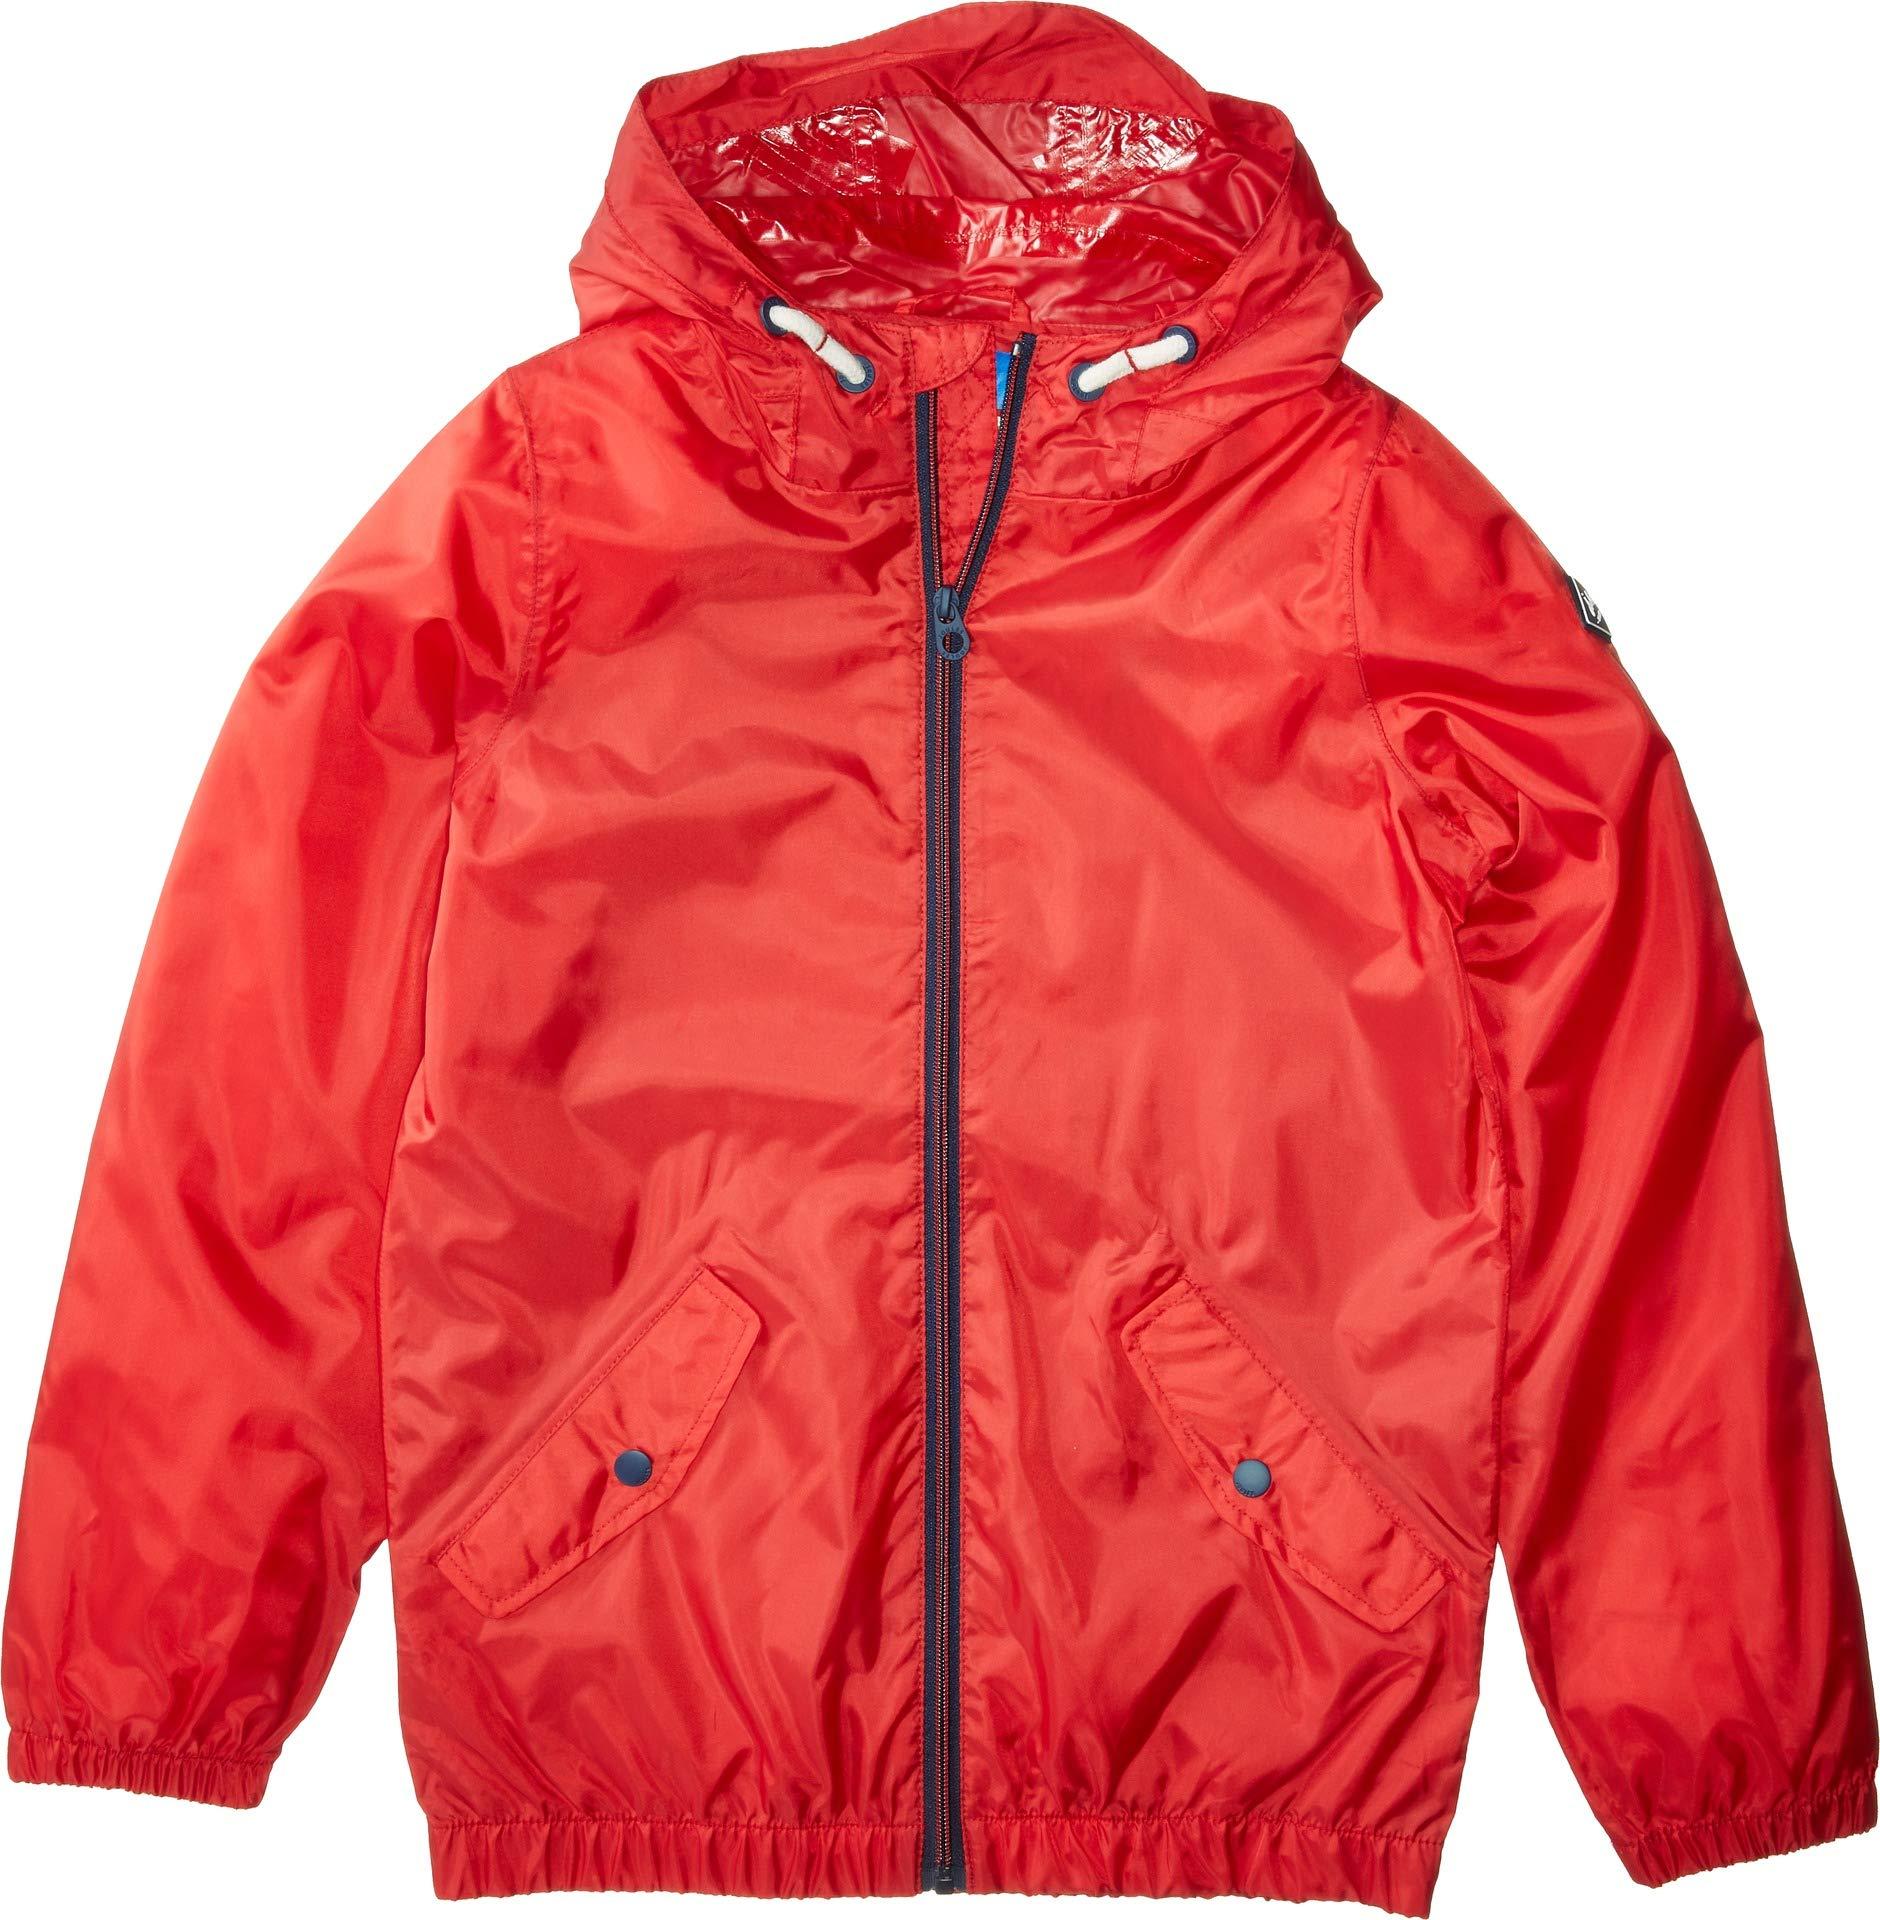 Joules Kids Baby Boy's Rowan Raincoat (Toddler/Little Kids/Big Kids) Red 5